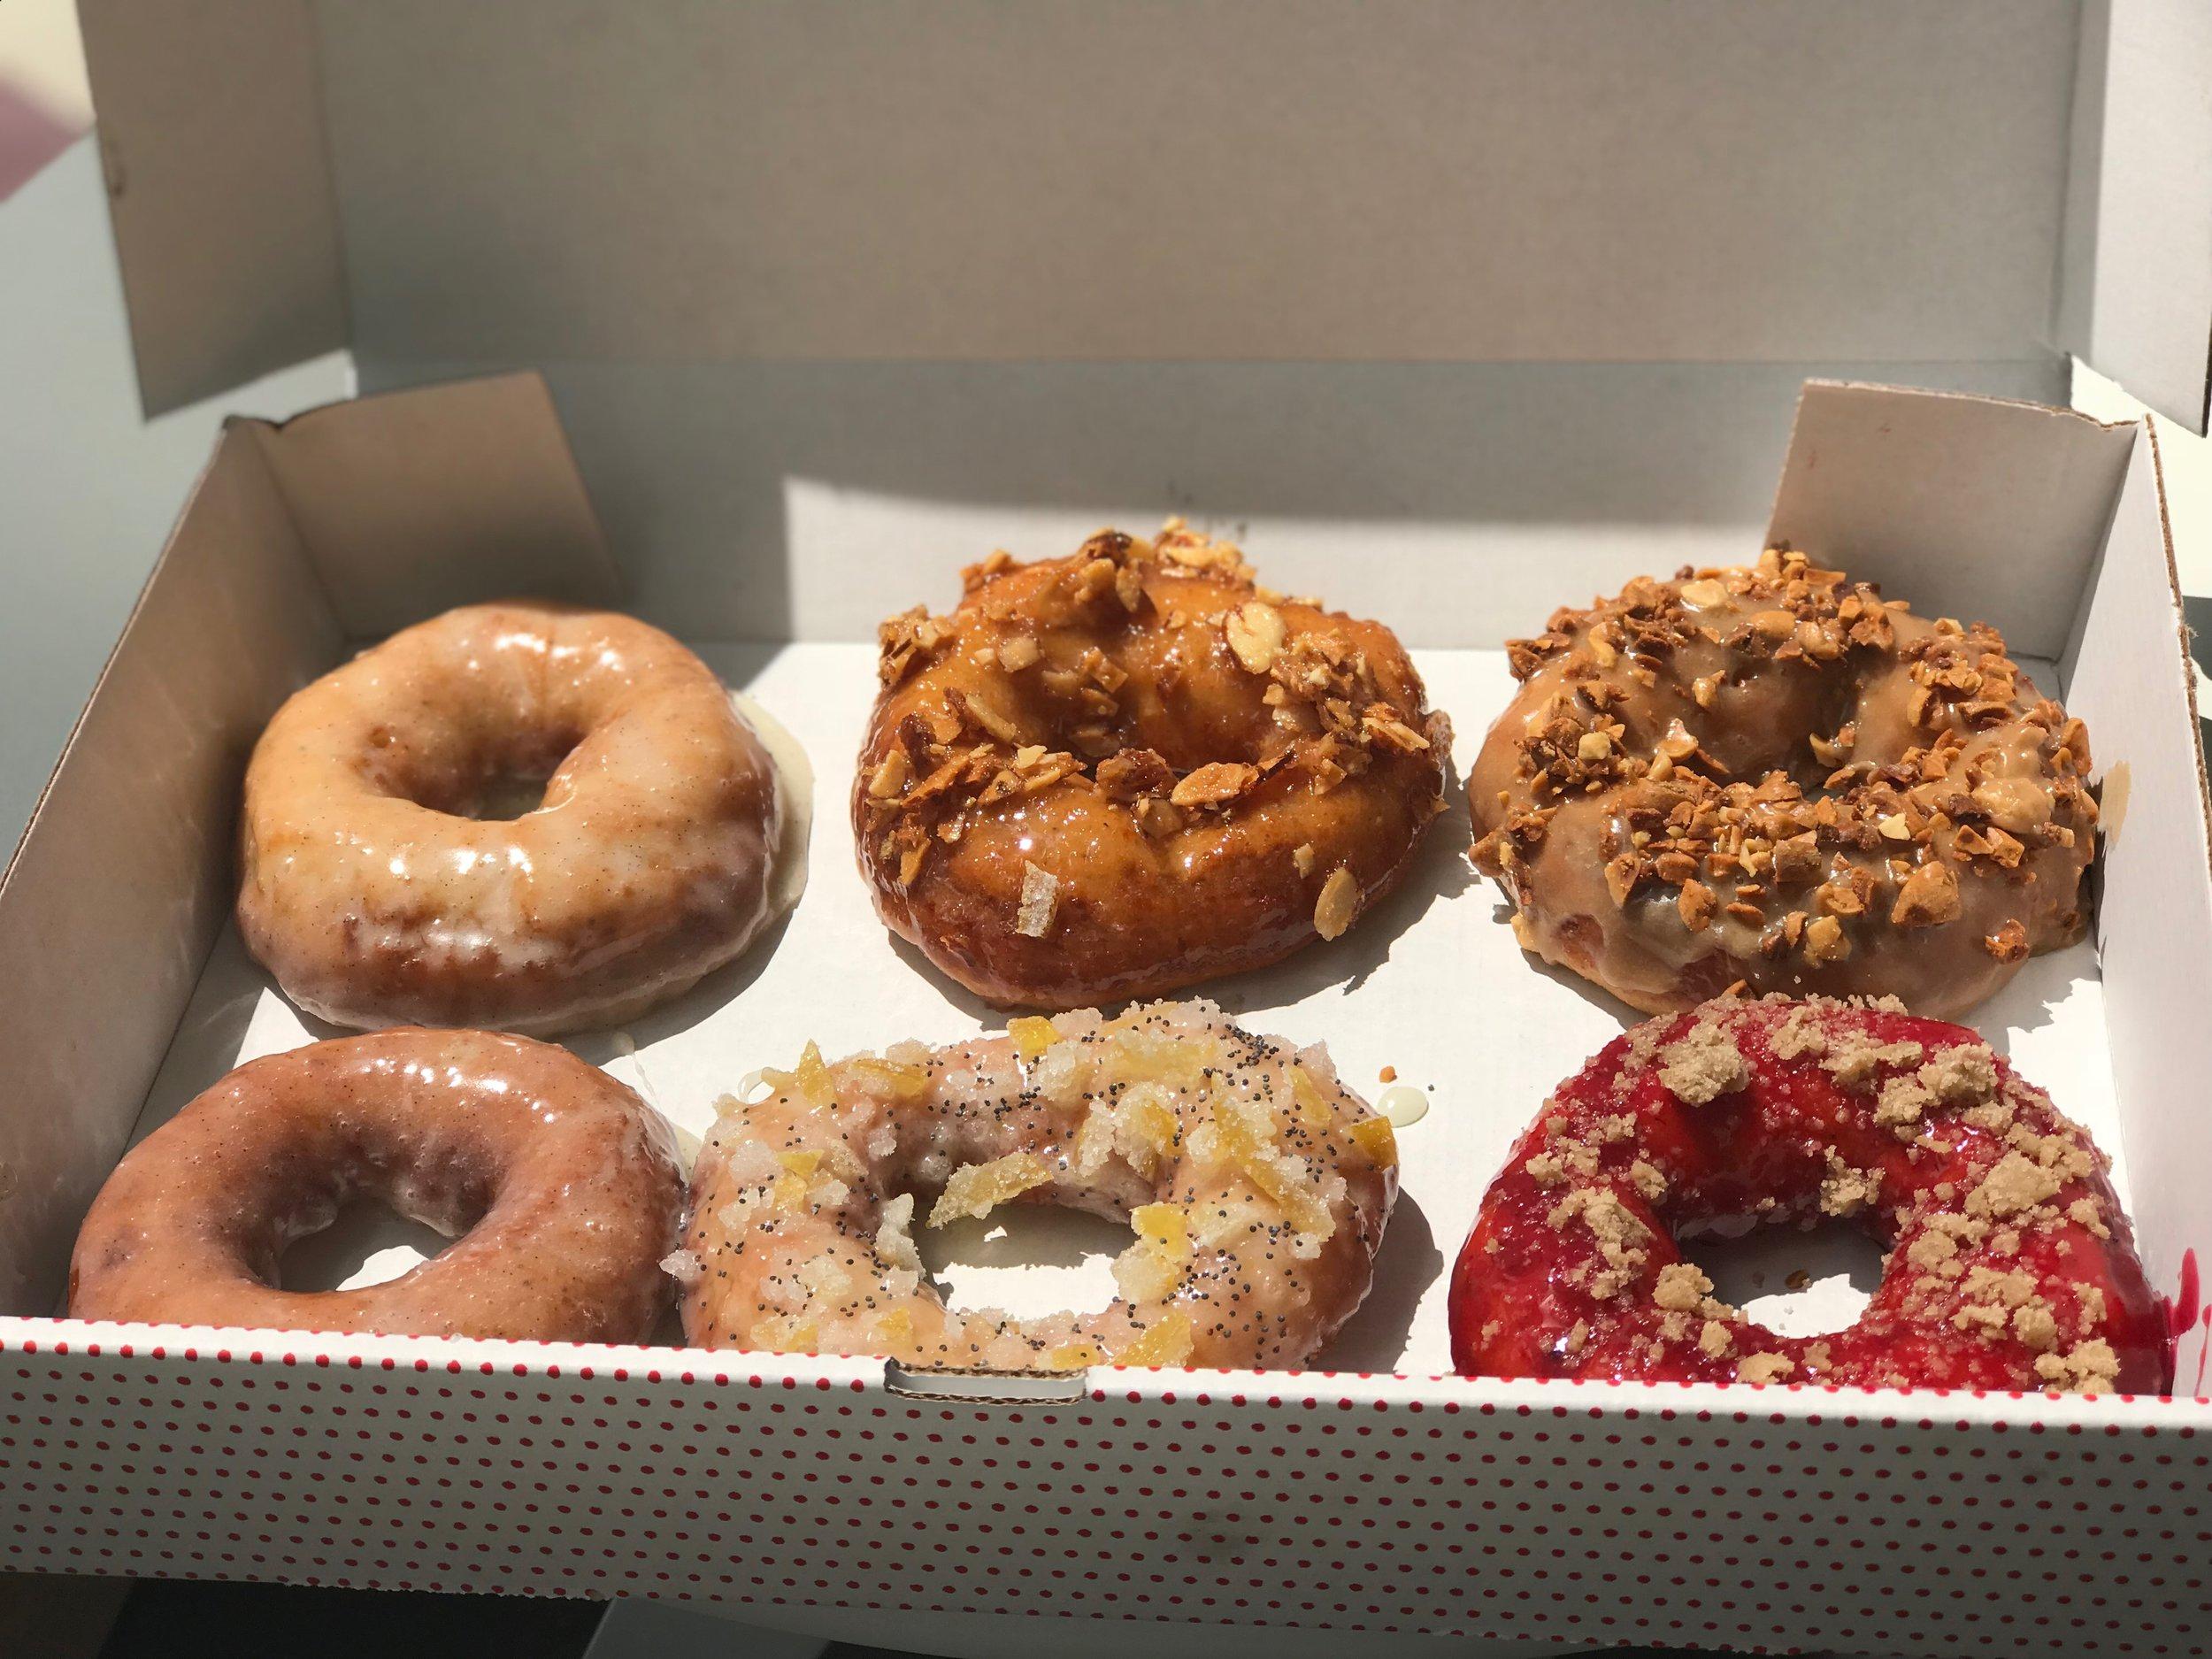 From top left: Vanilla Glaze, Nectarine Glaze, Maple Bourbon, Vanilla Glaze (repeat), Lemon Poppy, and Blackberry Cobbler